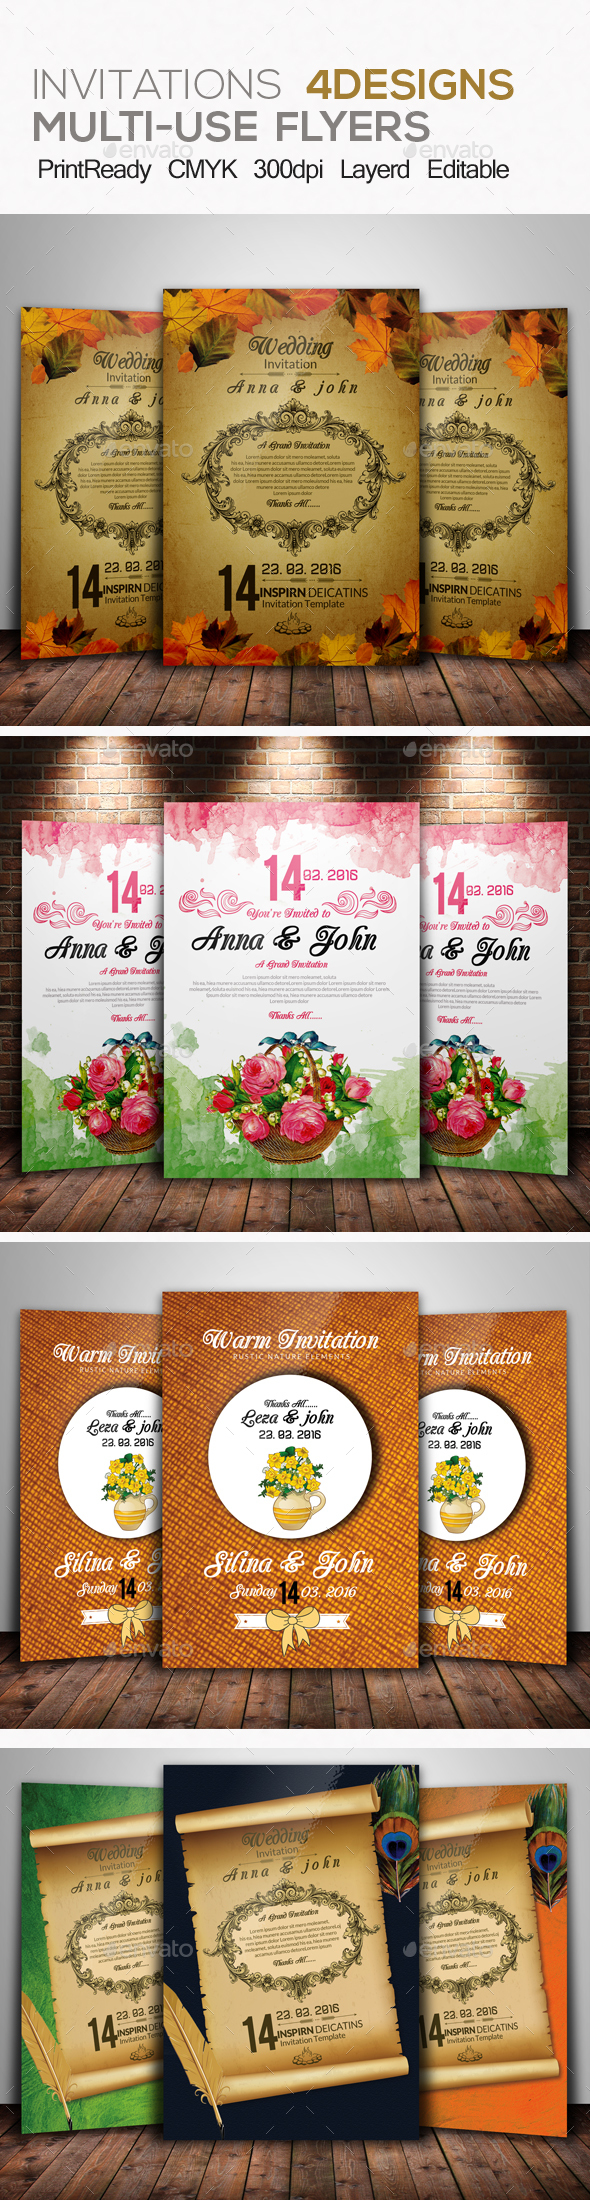 Wedding Invitation & RSVP Bundle - Weddings Cards & Invites